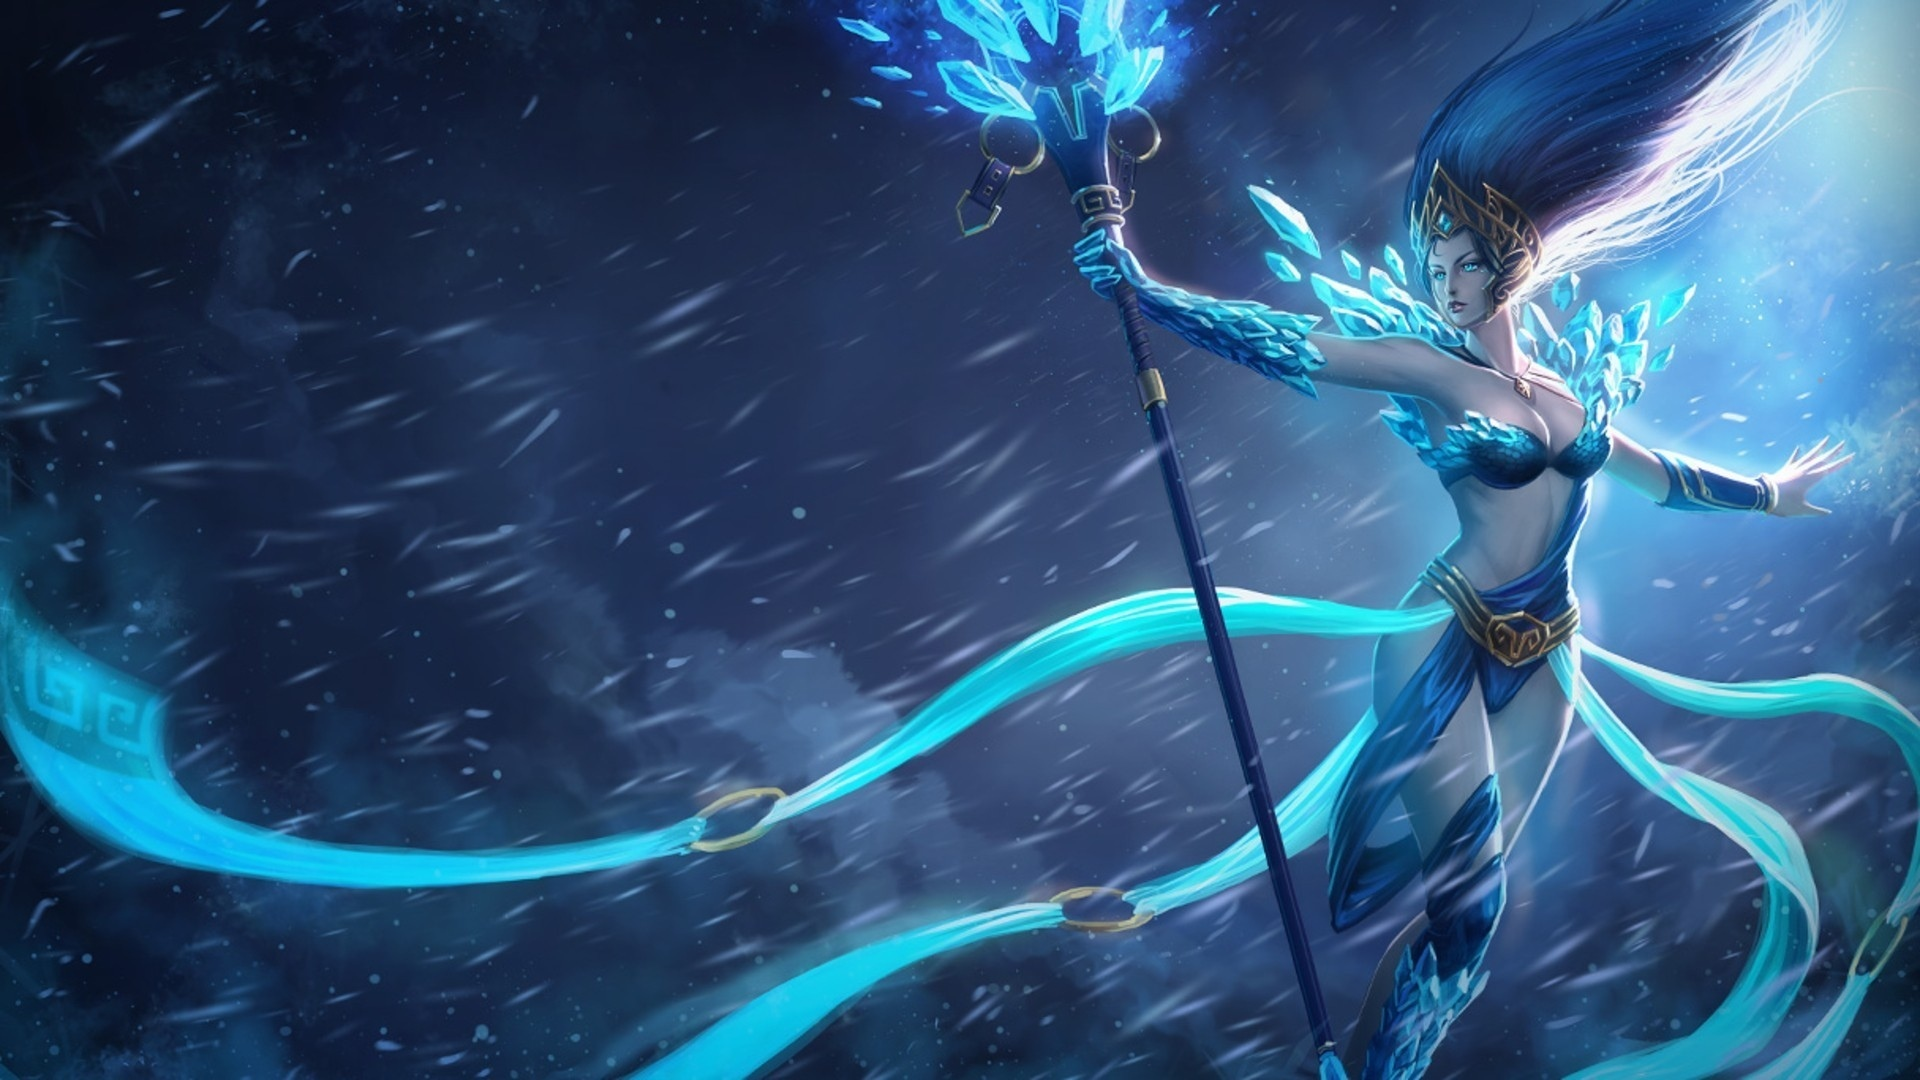 Blue Fantasy Girl   Wallpaper High Definition High Quality 1920x1080